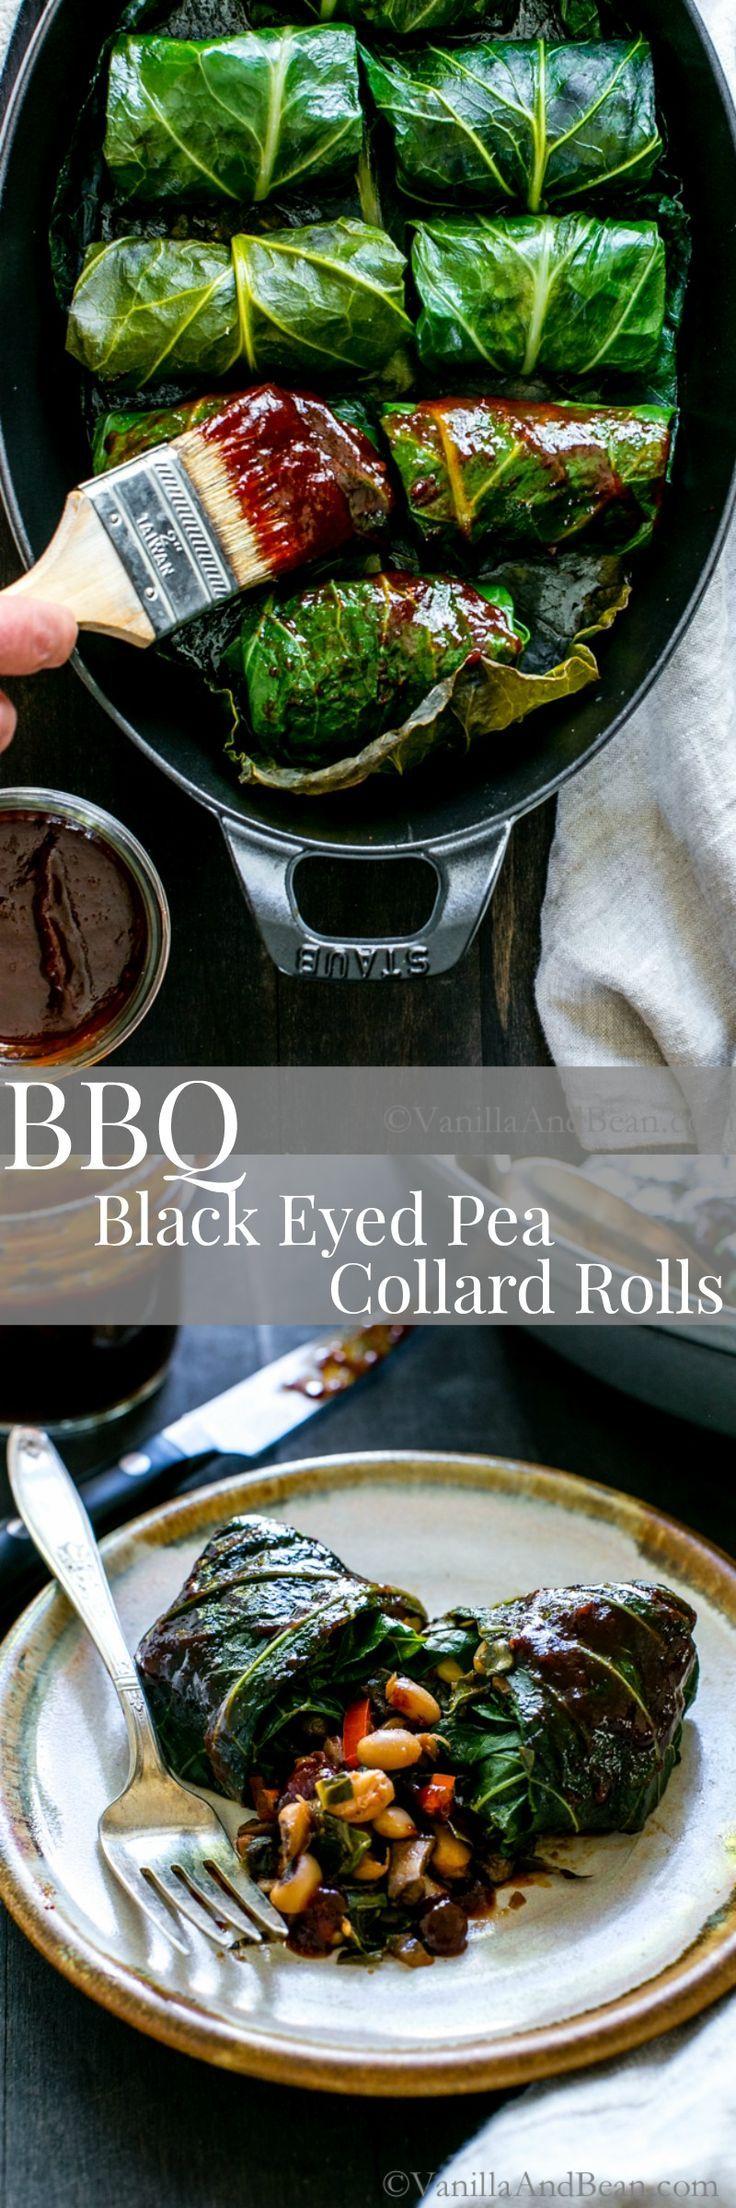 Best 25 vegan comfort food ideas on pinterest vegan dinners tangy hearty and pure comfort food bbq black eyed pea collard rolls vegan forumfinder Gallery